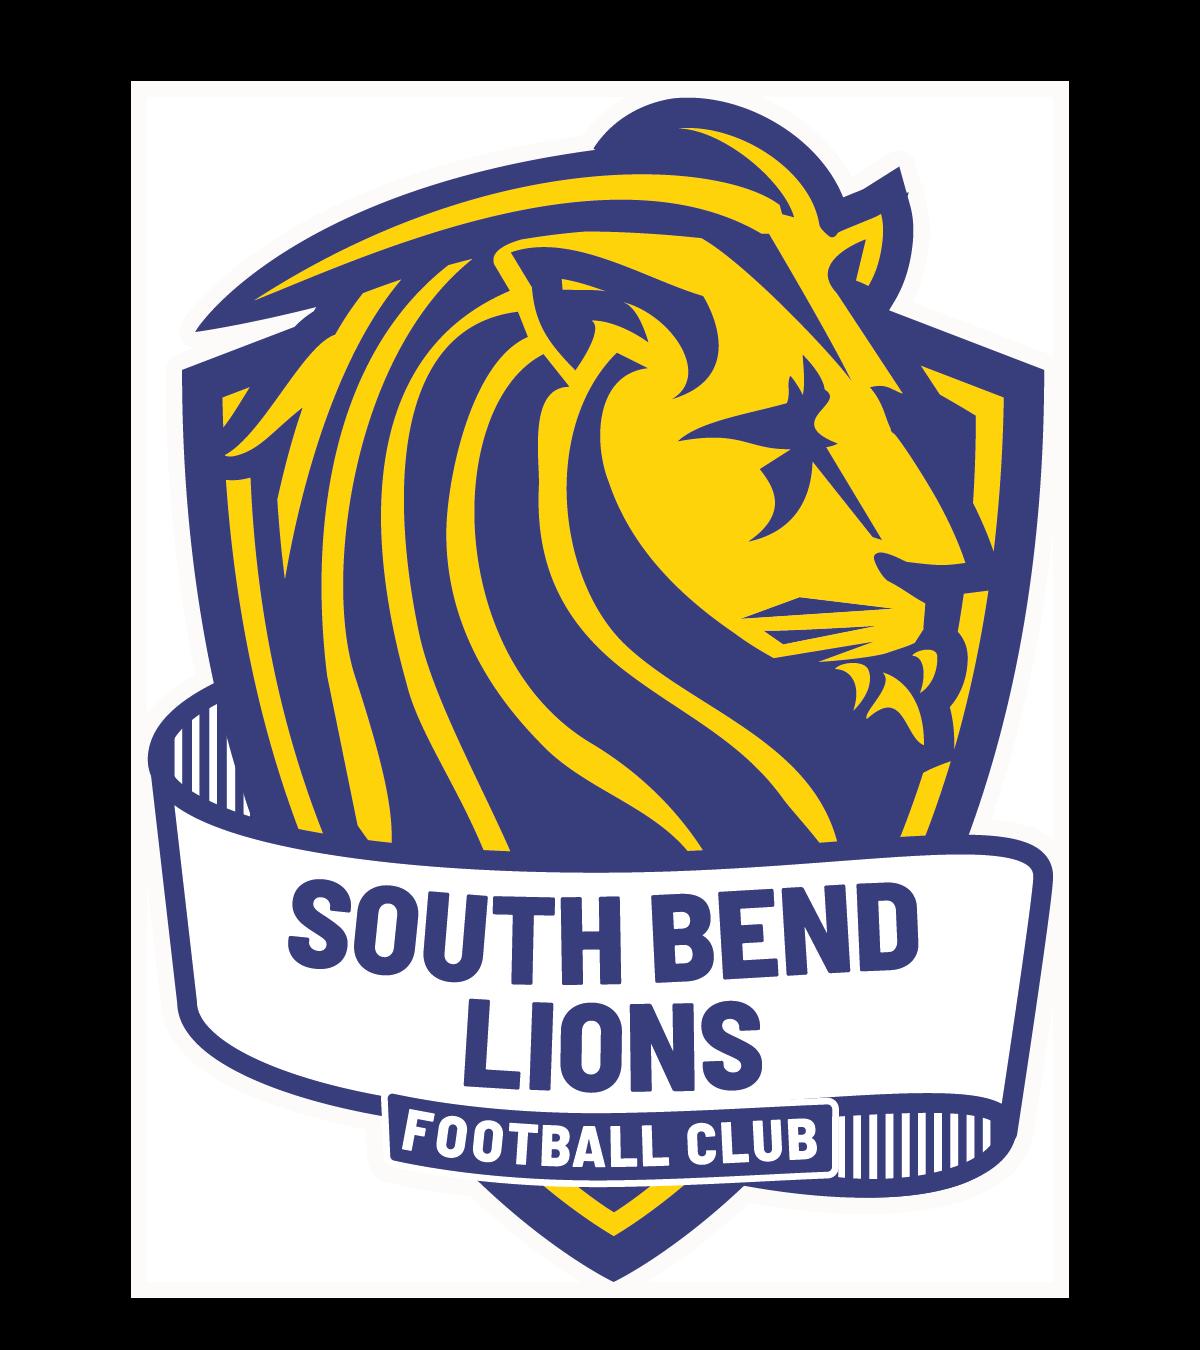 South Bend Lions